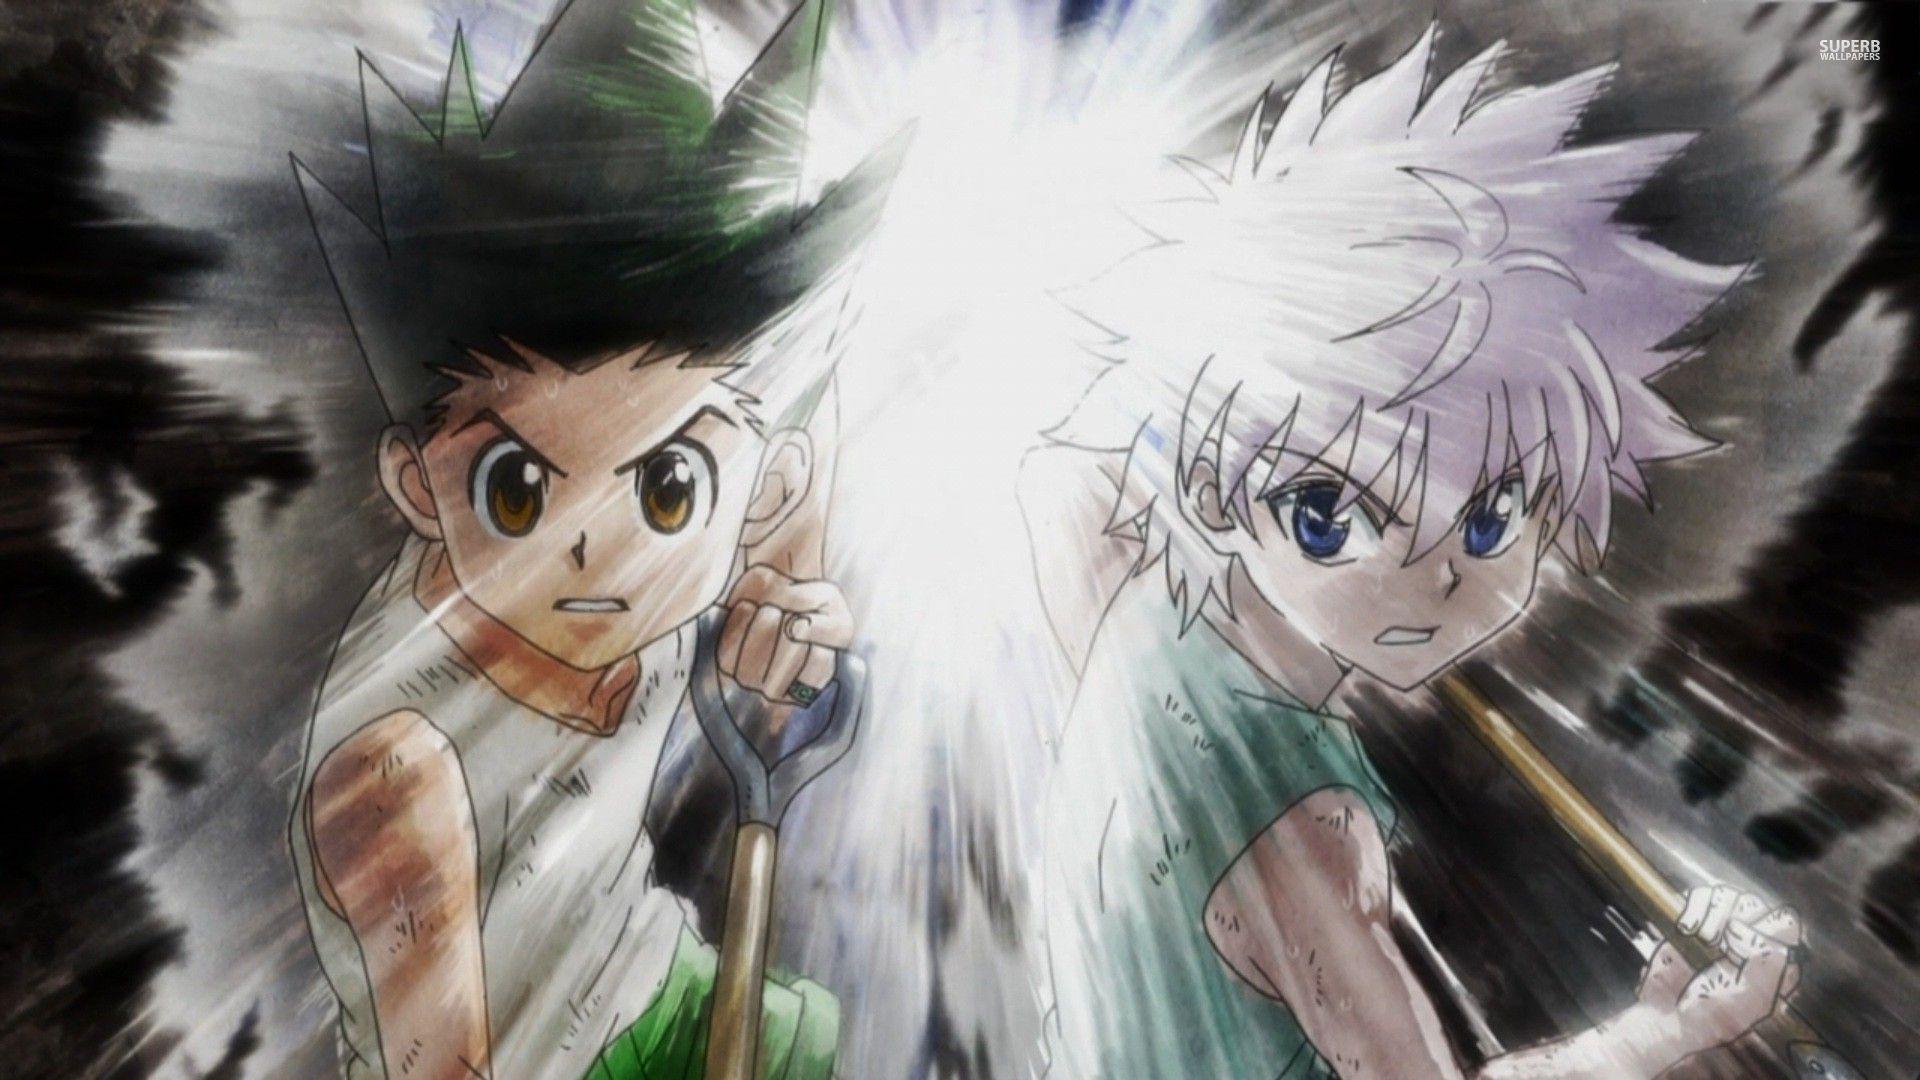 560963 Jpg 1920 1080 Anime Hunter Killua Anime